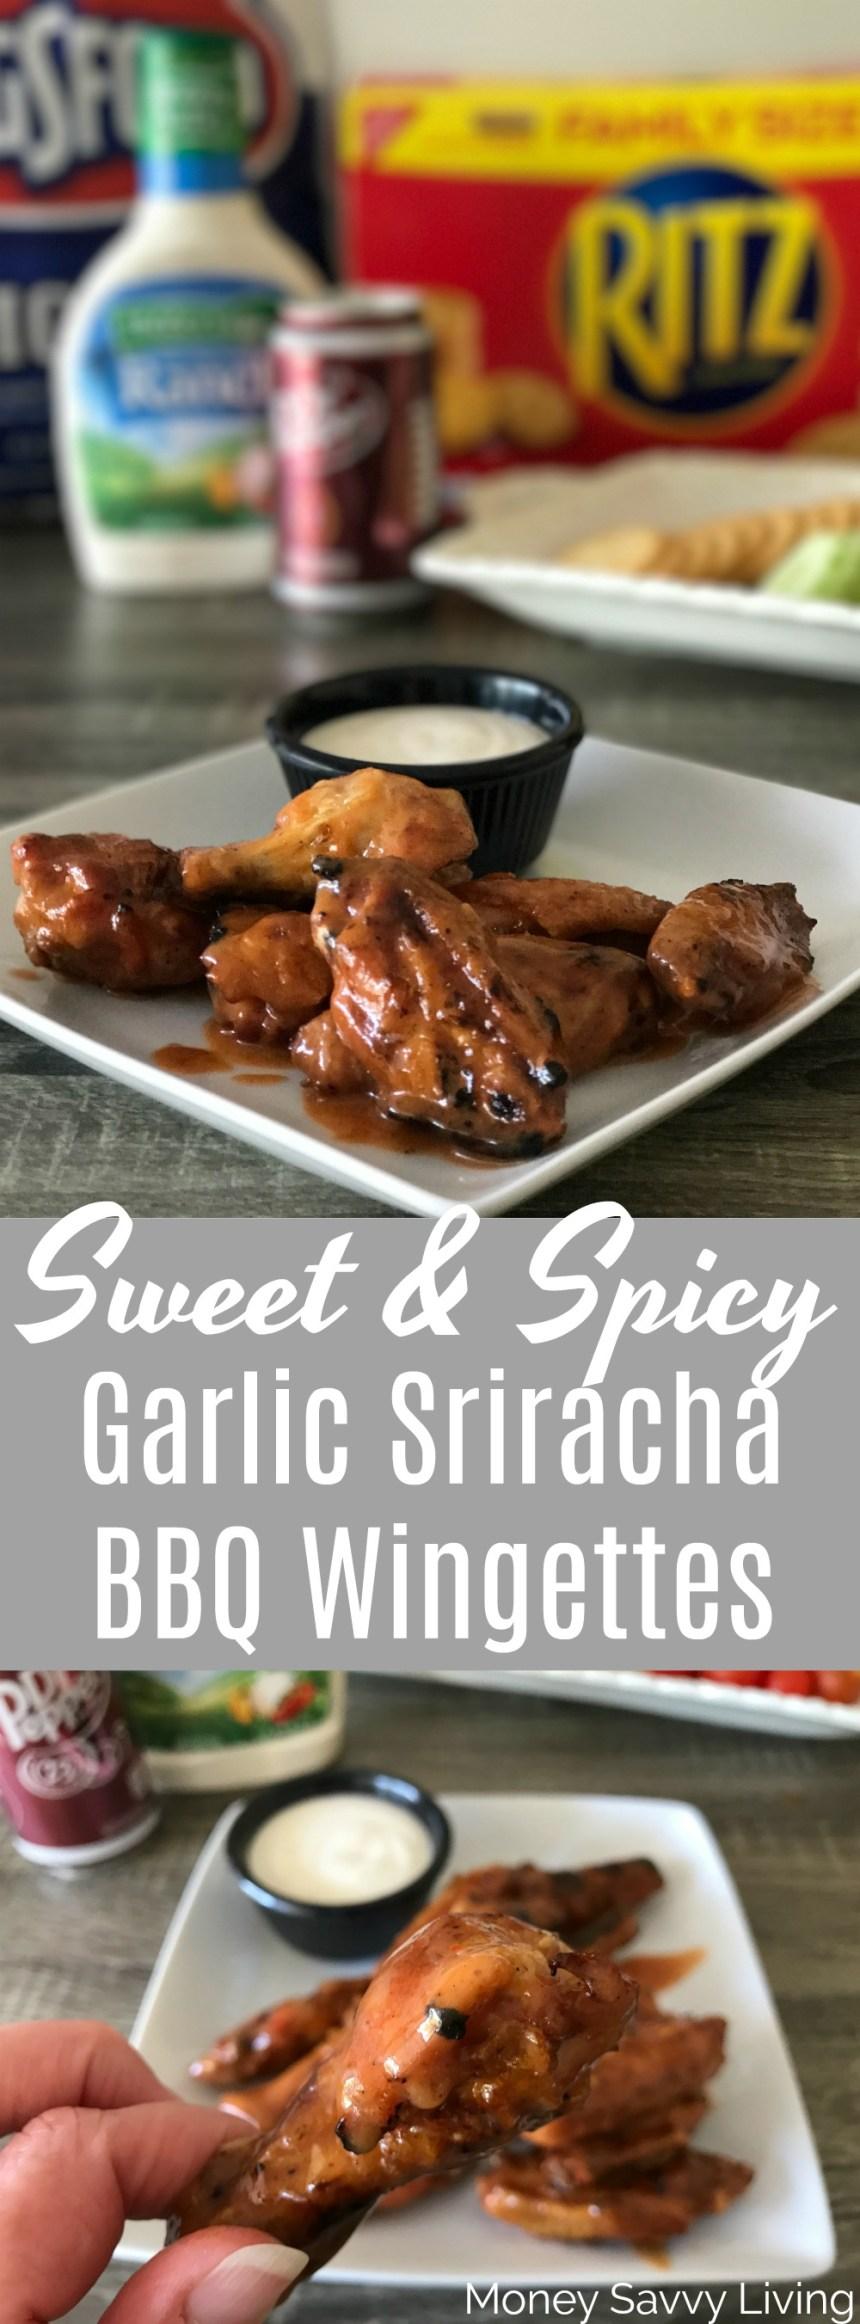 Sweet & Spicy Garlic Sriracha BBQ Wingettes // Money Savvy Living